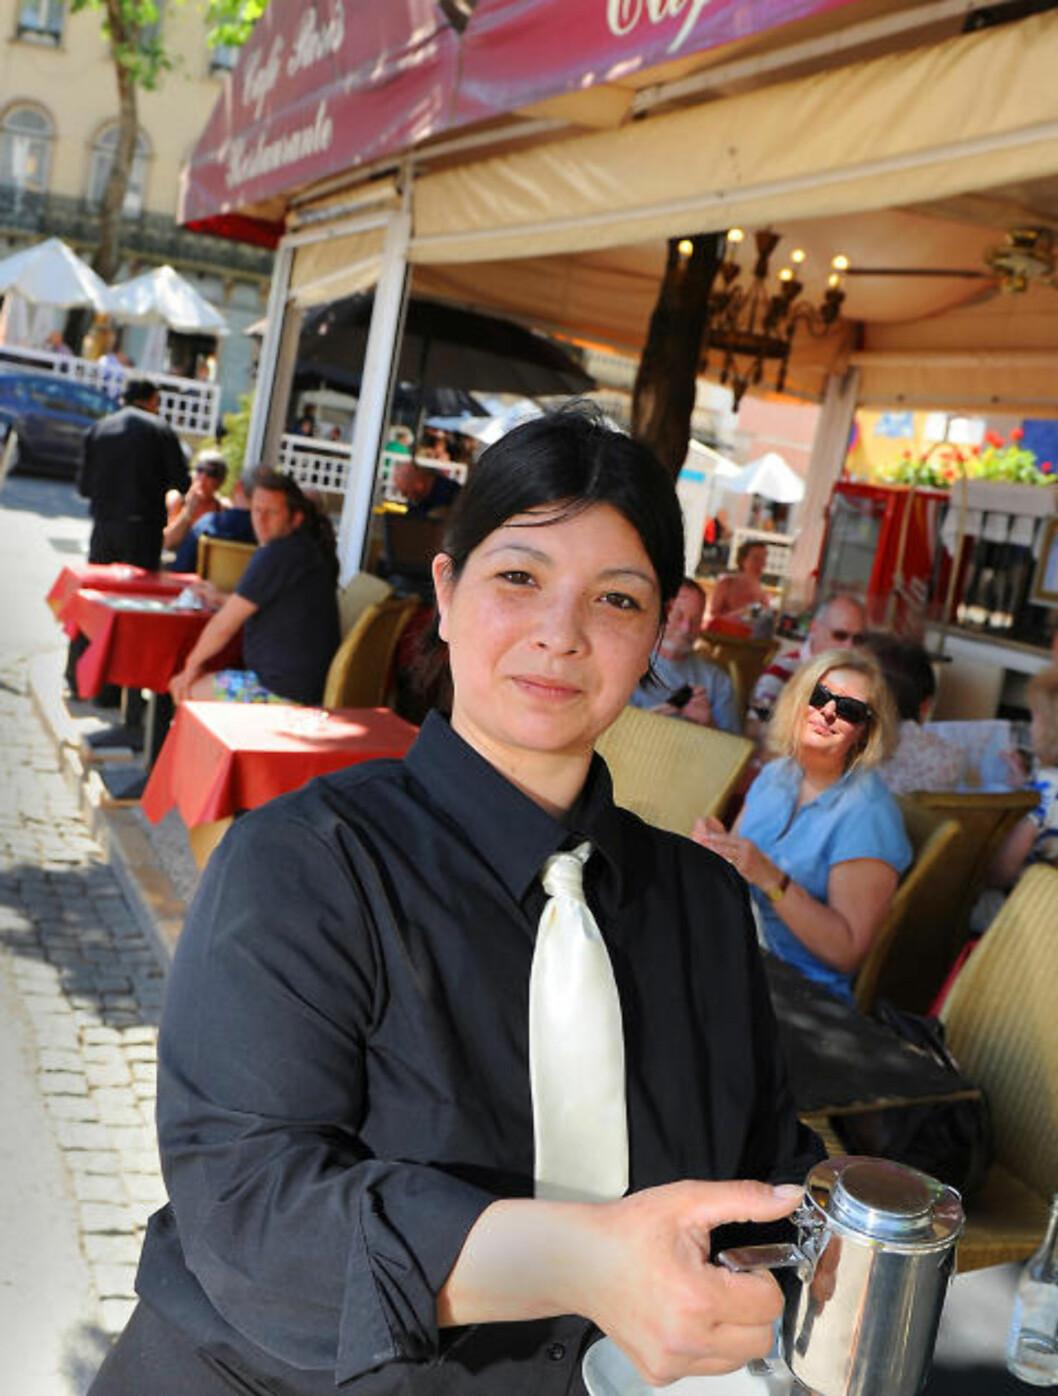 <strong>KAFELIV:</strong> Kelner Emma på Café de Paris er både blid og serviceinnstilt. Foto: MARIANNE OTTERDAHL-JENSEN